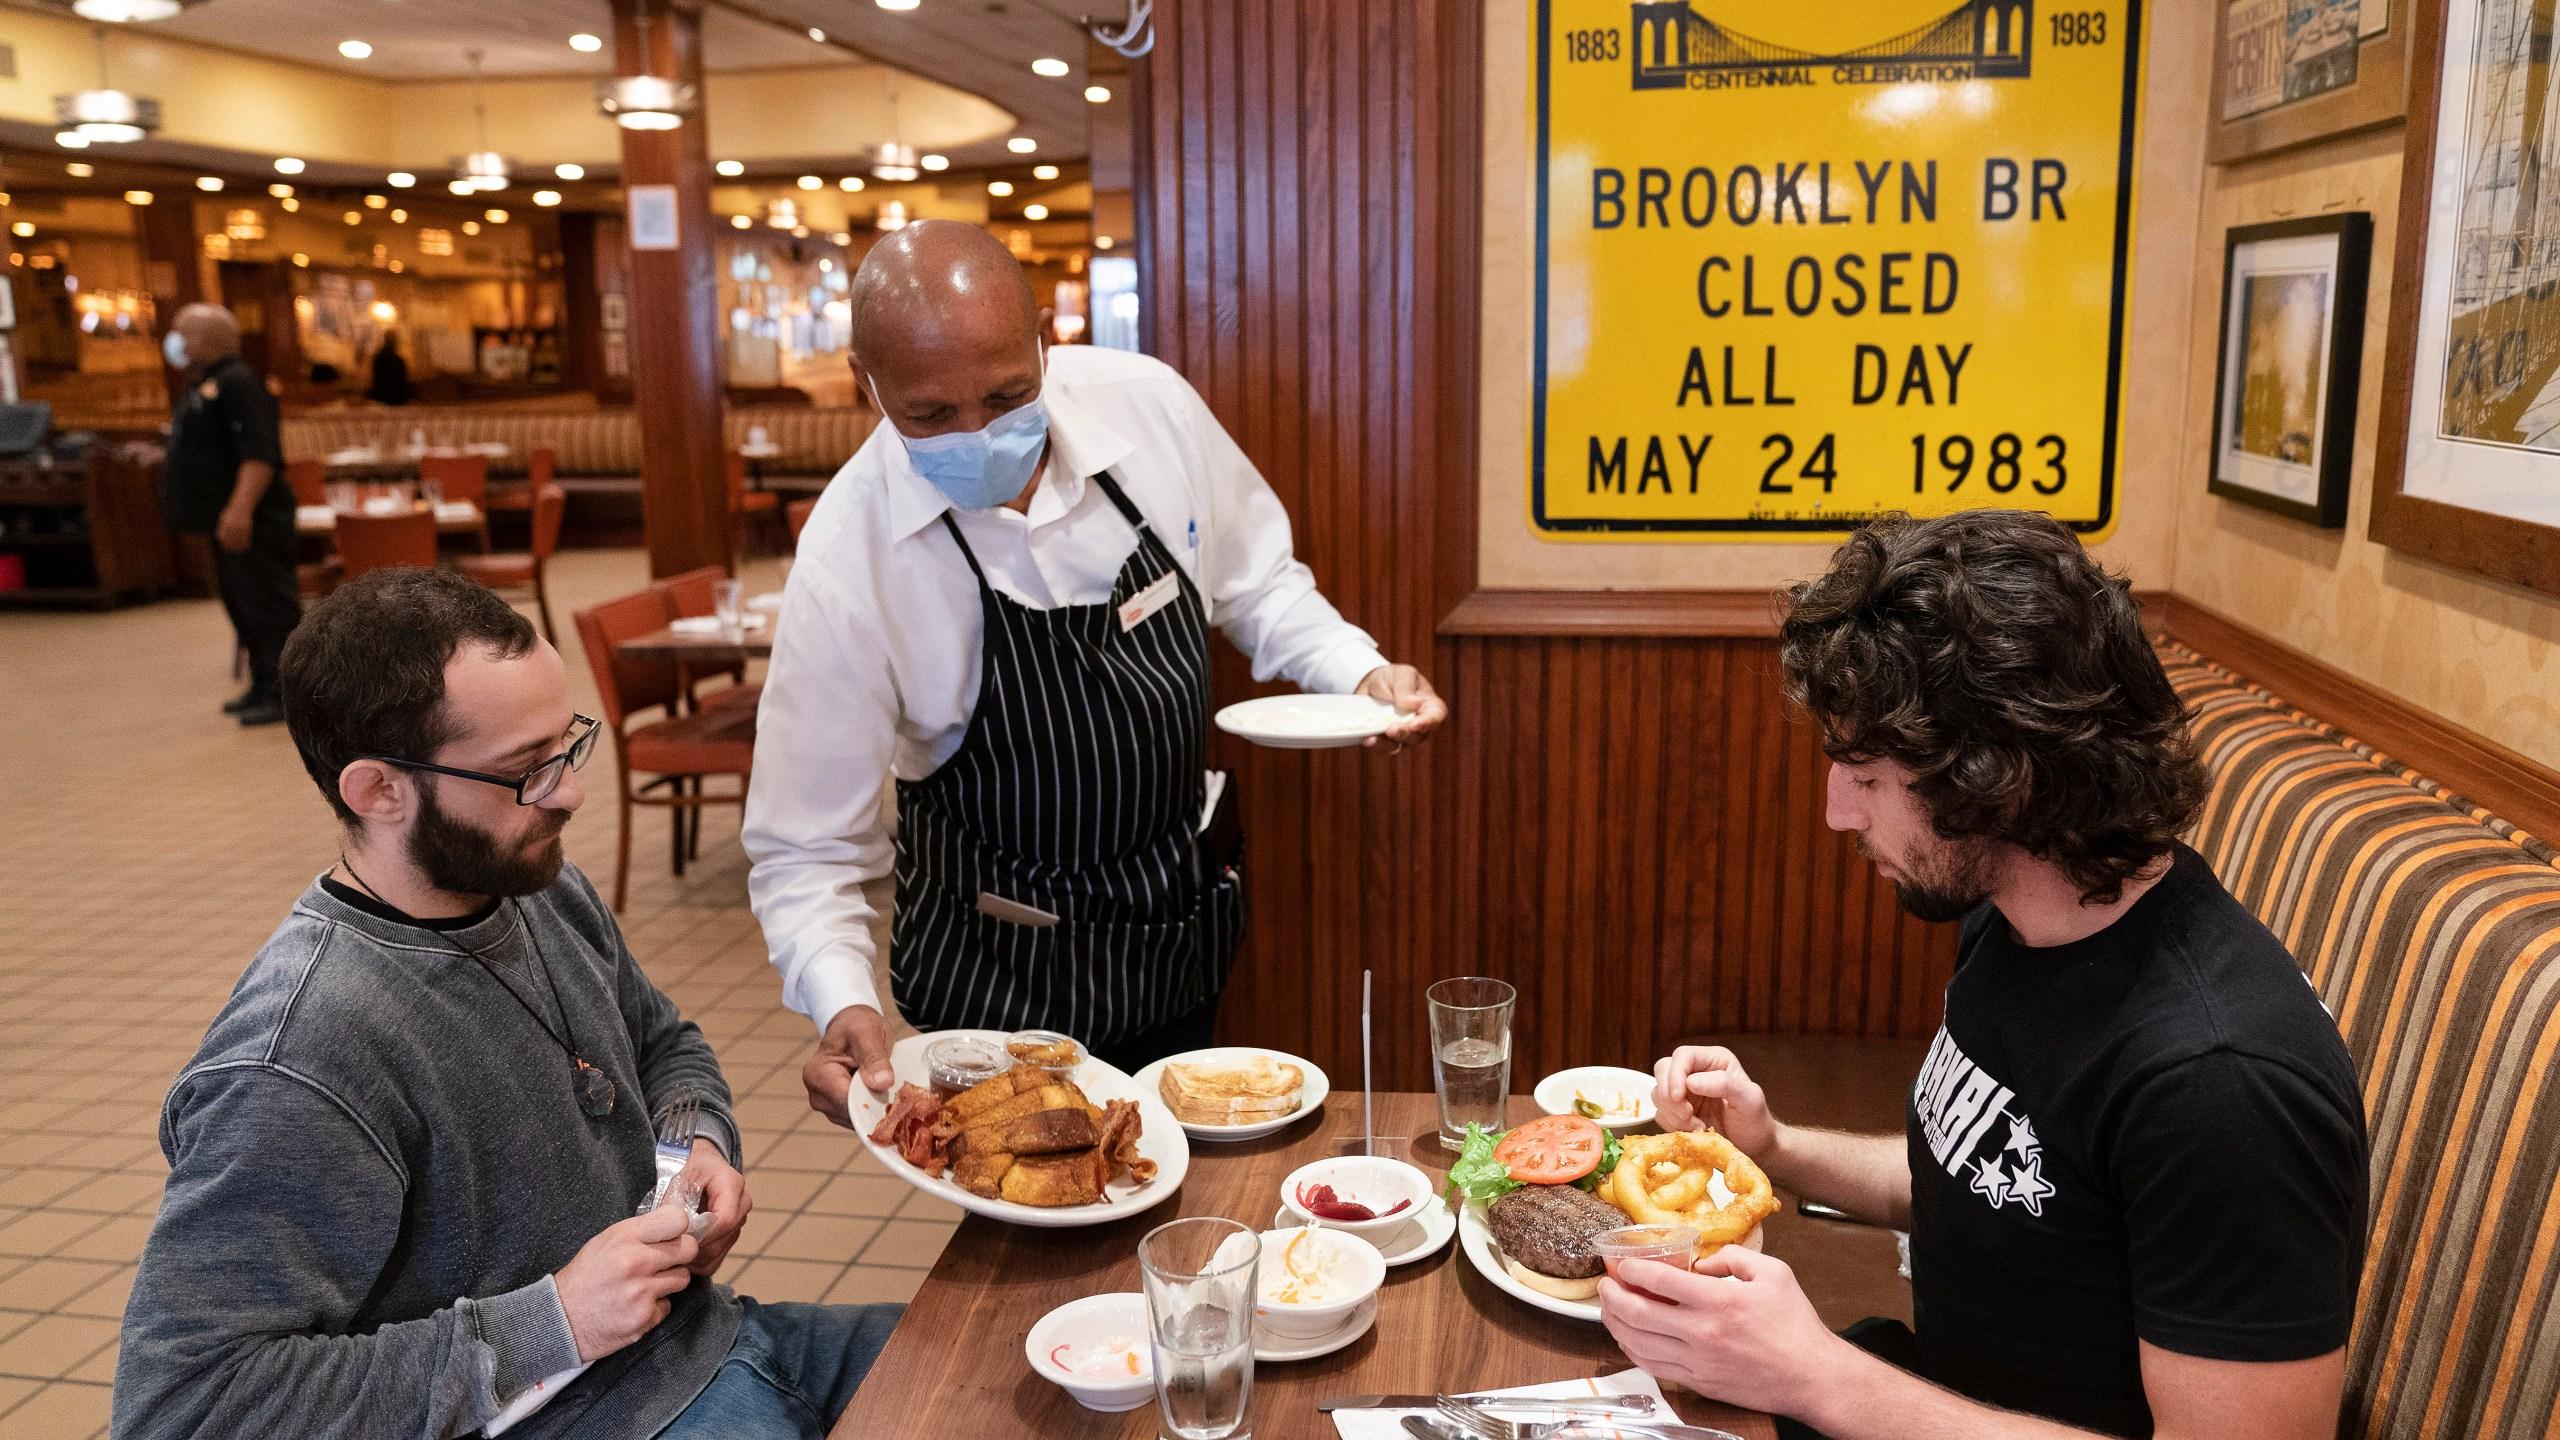 nyc indoor dining filephoto